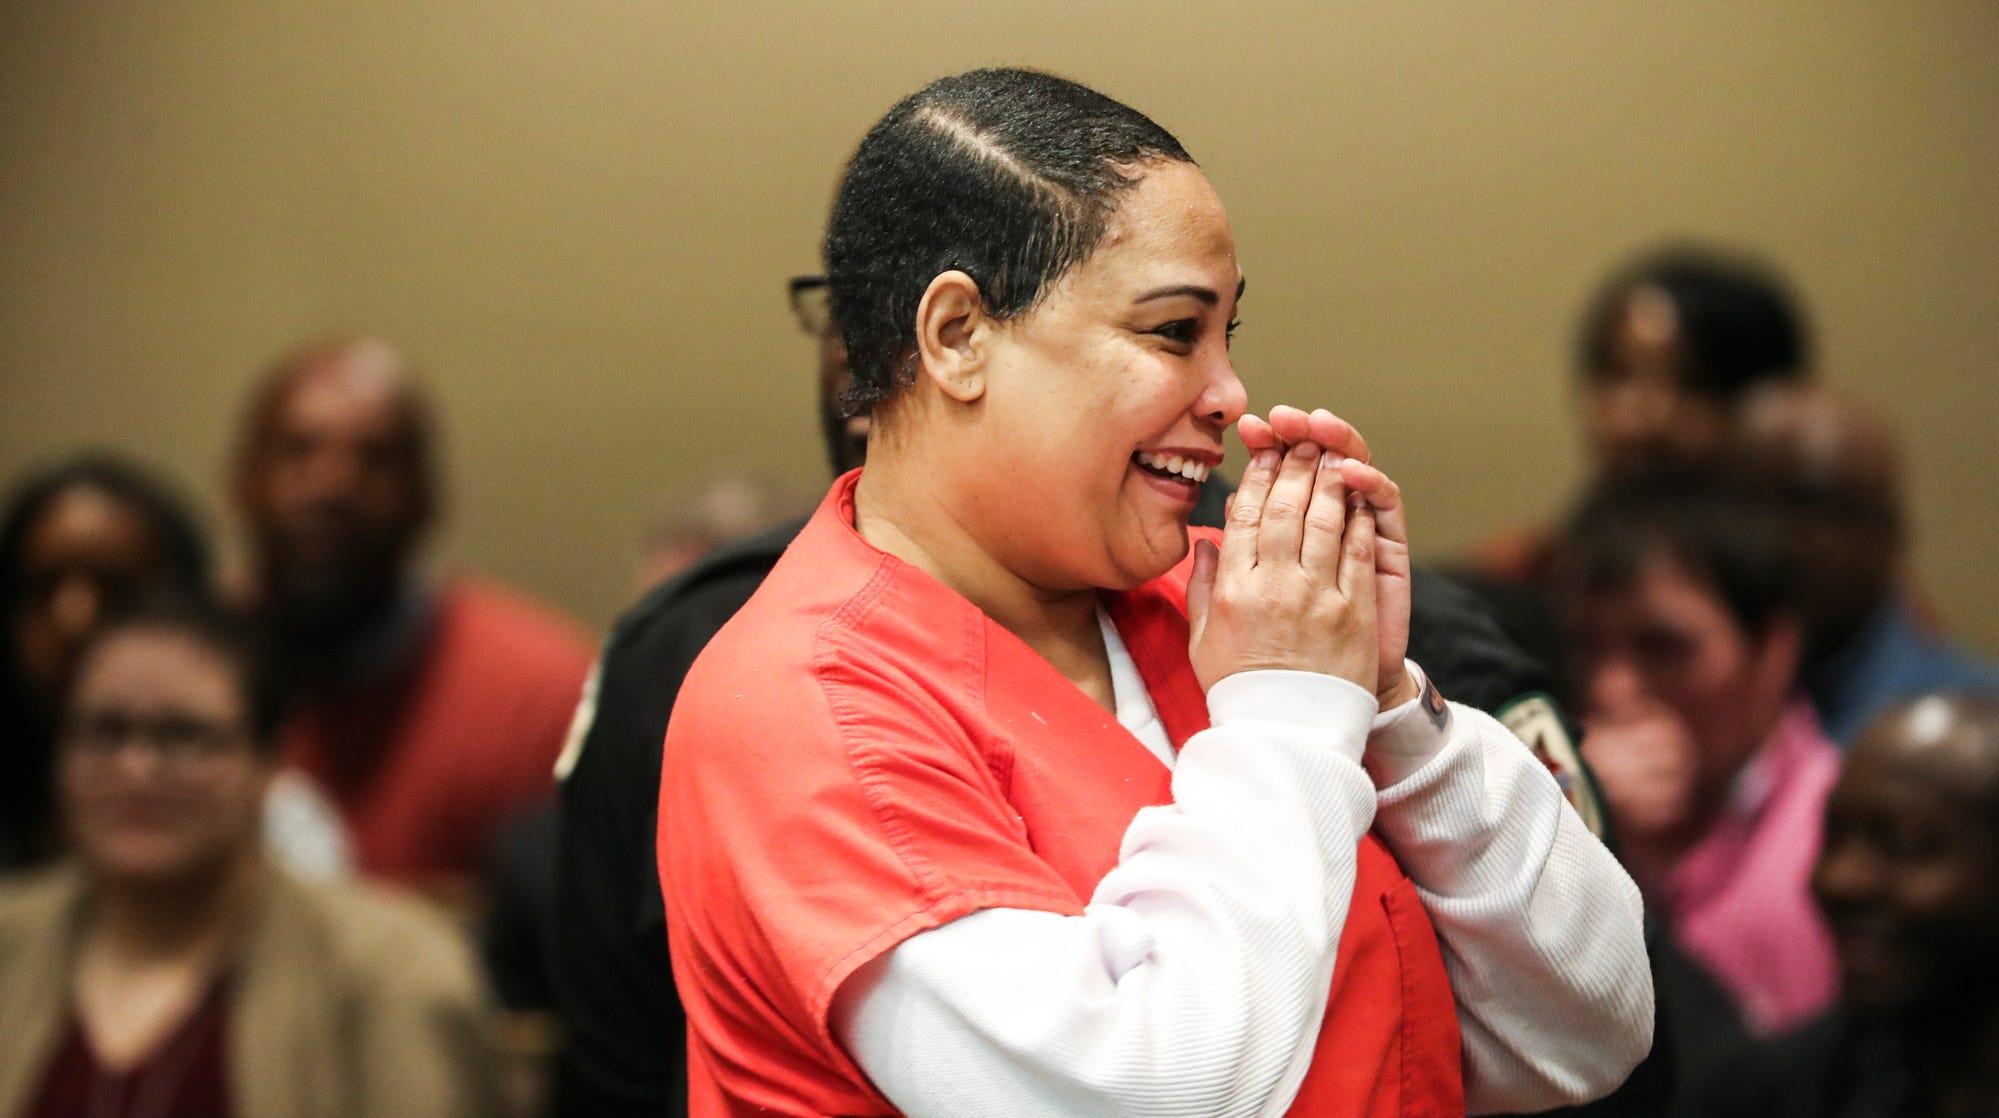 Lorenzen Wright Nba >> Lorenzen Wright Killing Sherra Wright Billy Ray Turner Trial Date Set